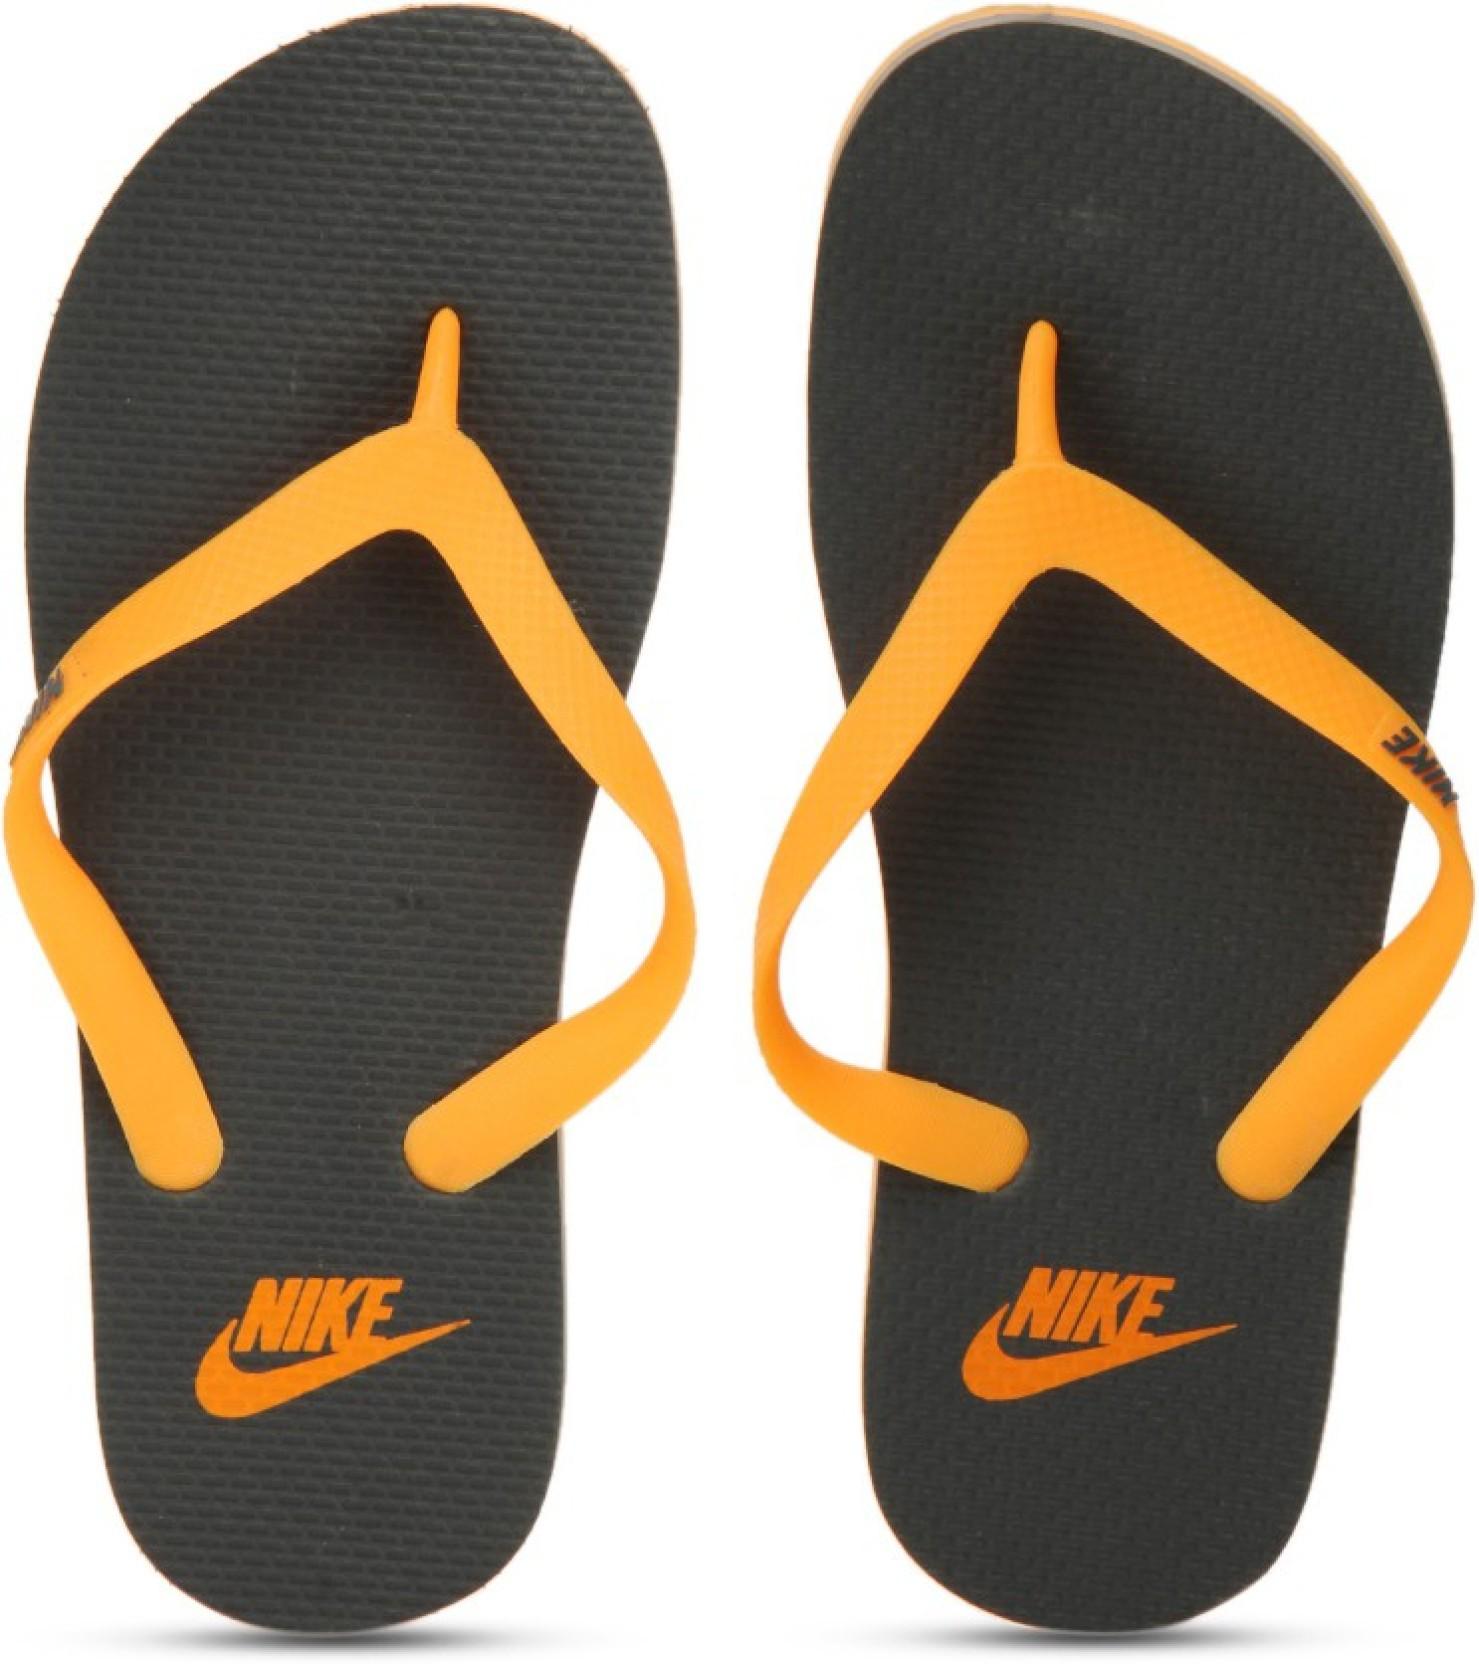 4afa828de78 Nike AQUASWIFT THONG Slippers - Buy Laser Orange Dark Grey Color ...